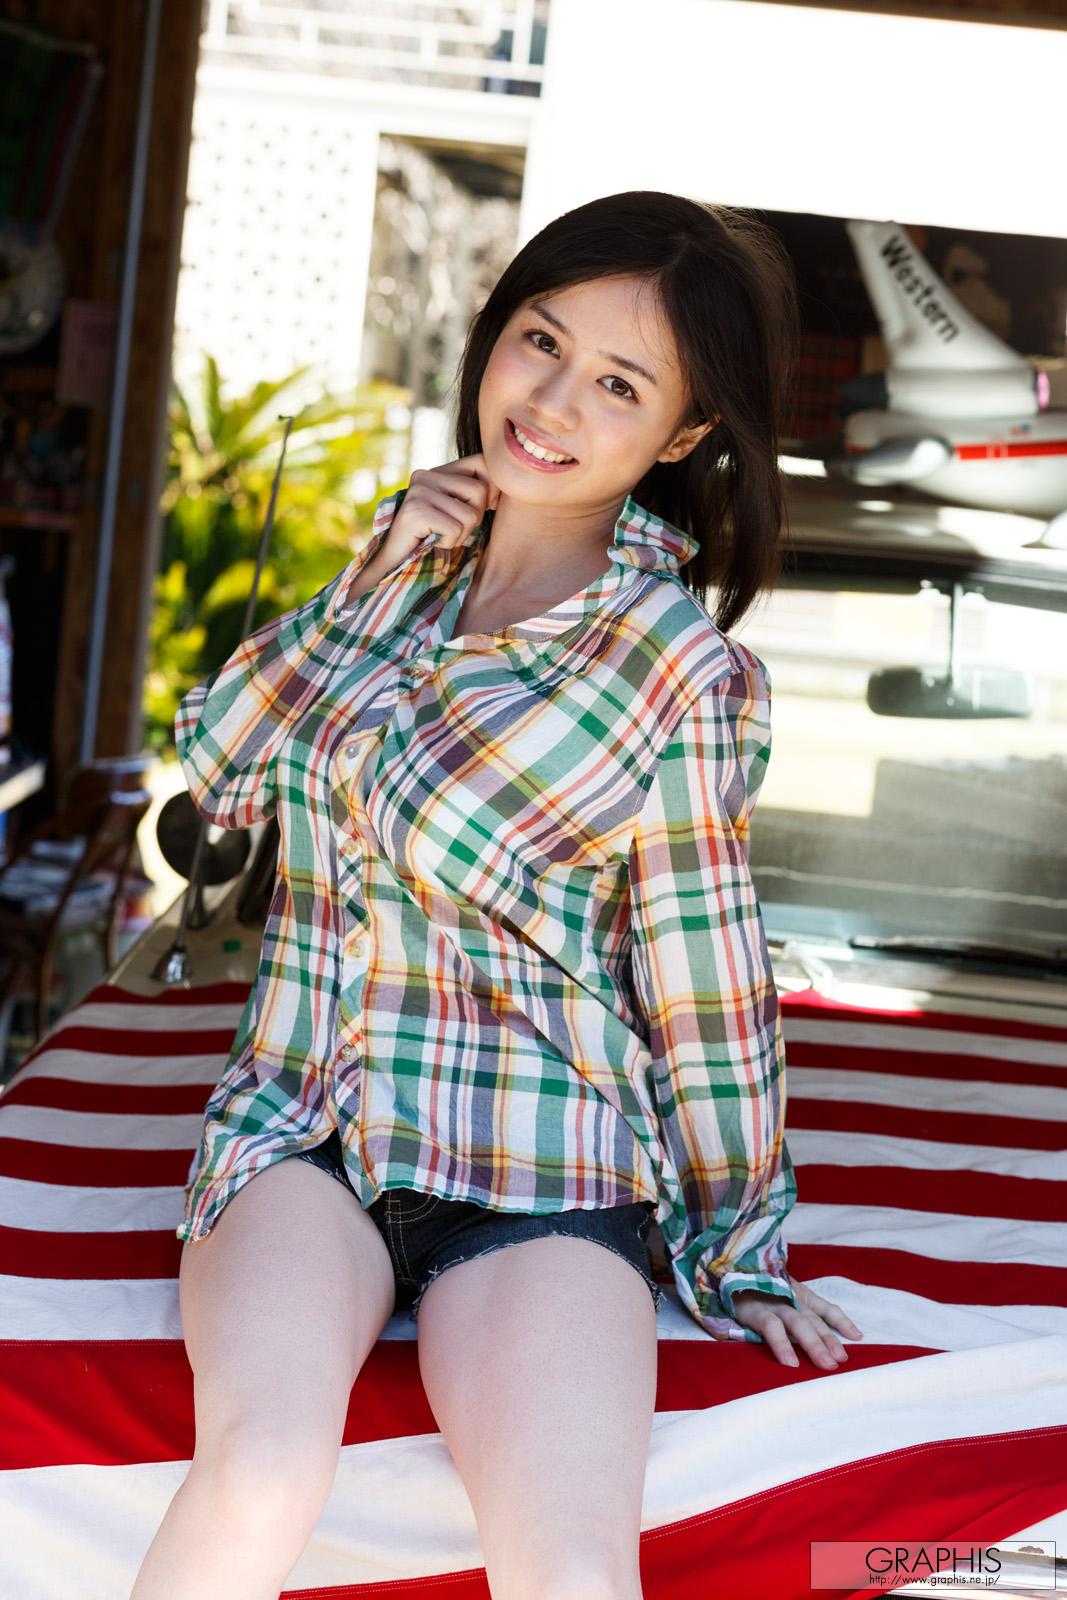 Aimi Yoshikawa nude (97 photo), photos Pussy, iCloud, butt 2017